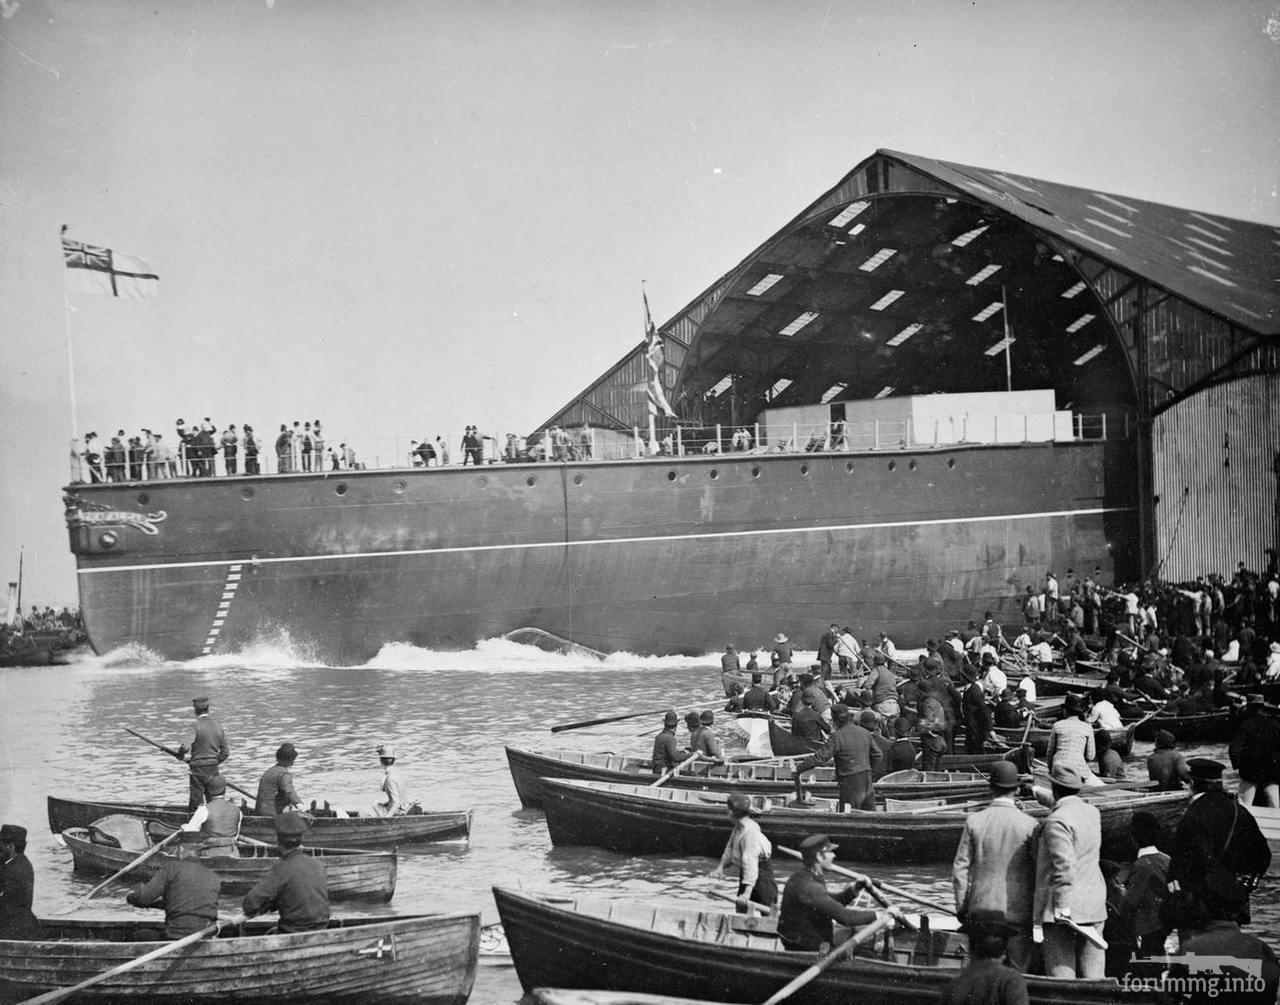 138063 - Спуск на воду броненосца HMS Trafalgar в Портсмуте, 20 сентября 1887 г.